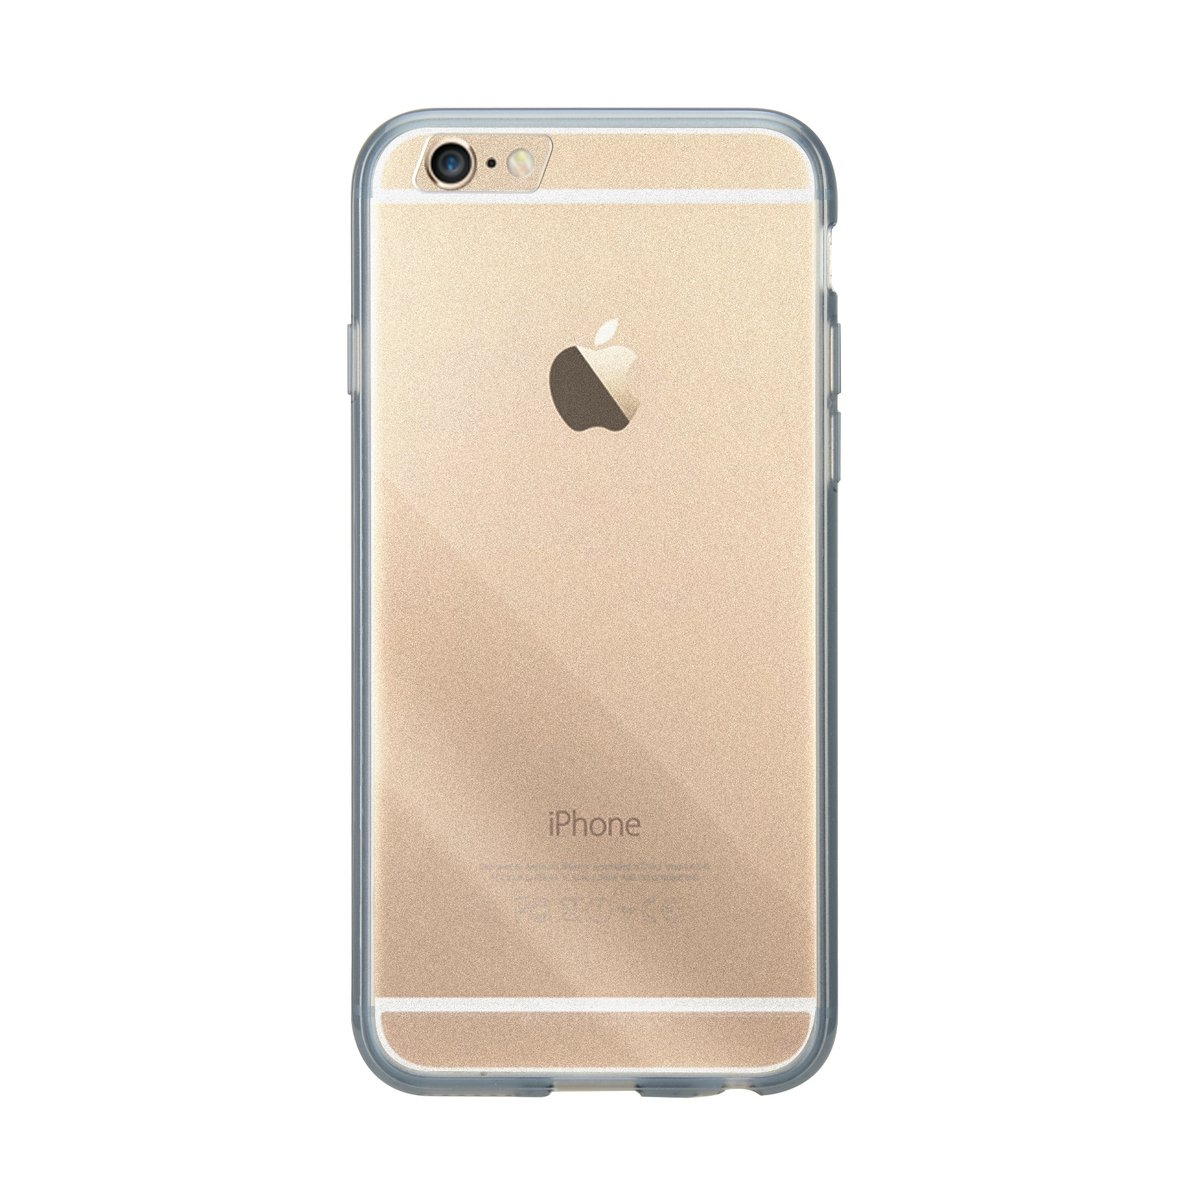 "iPhone 6/6S (4.7"") PolyUltima 手機保護殼 - 透明黑色(附送屏幕保護貼)"